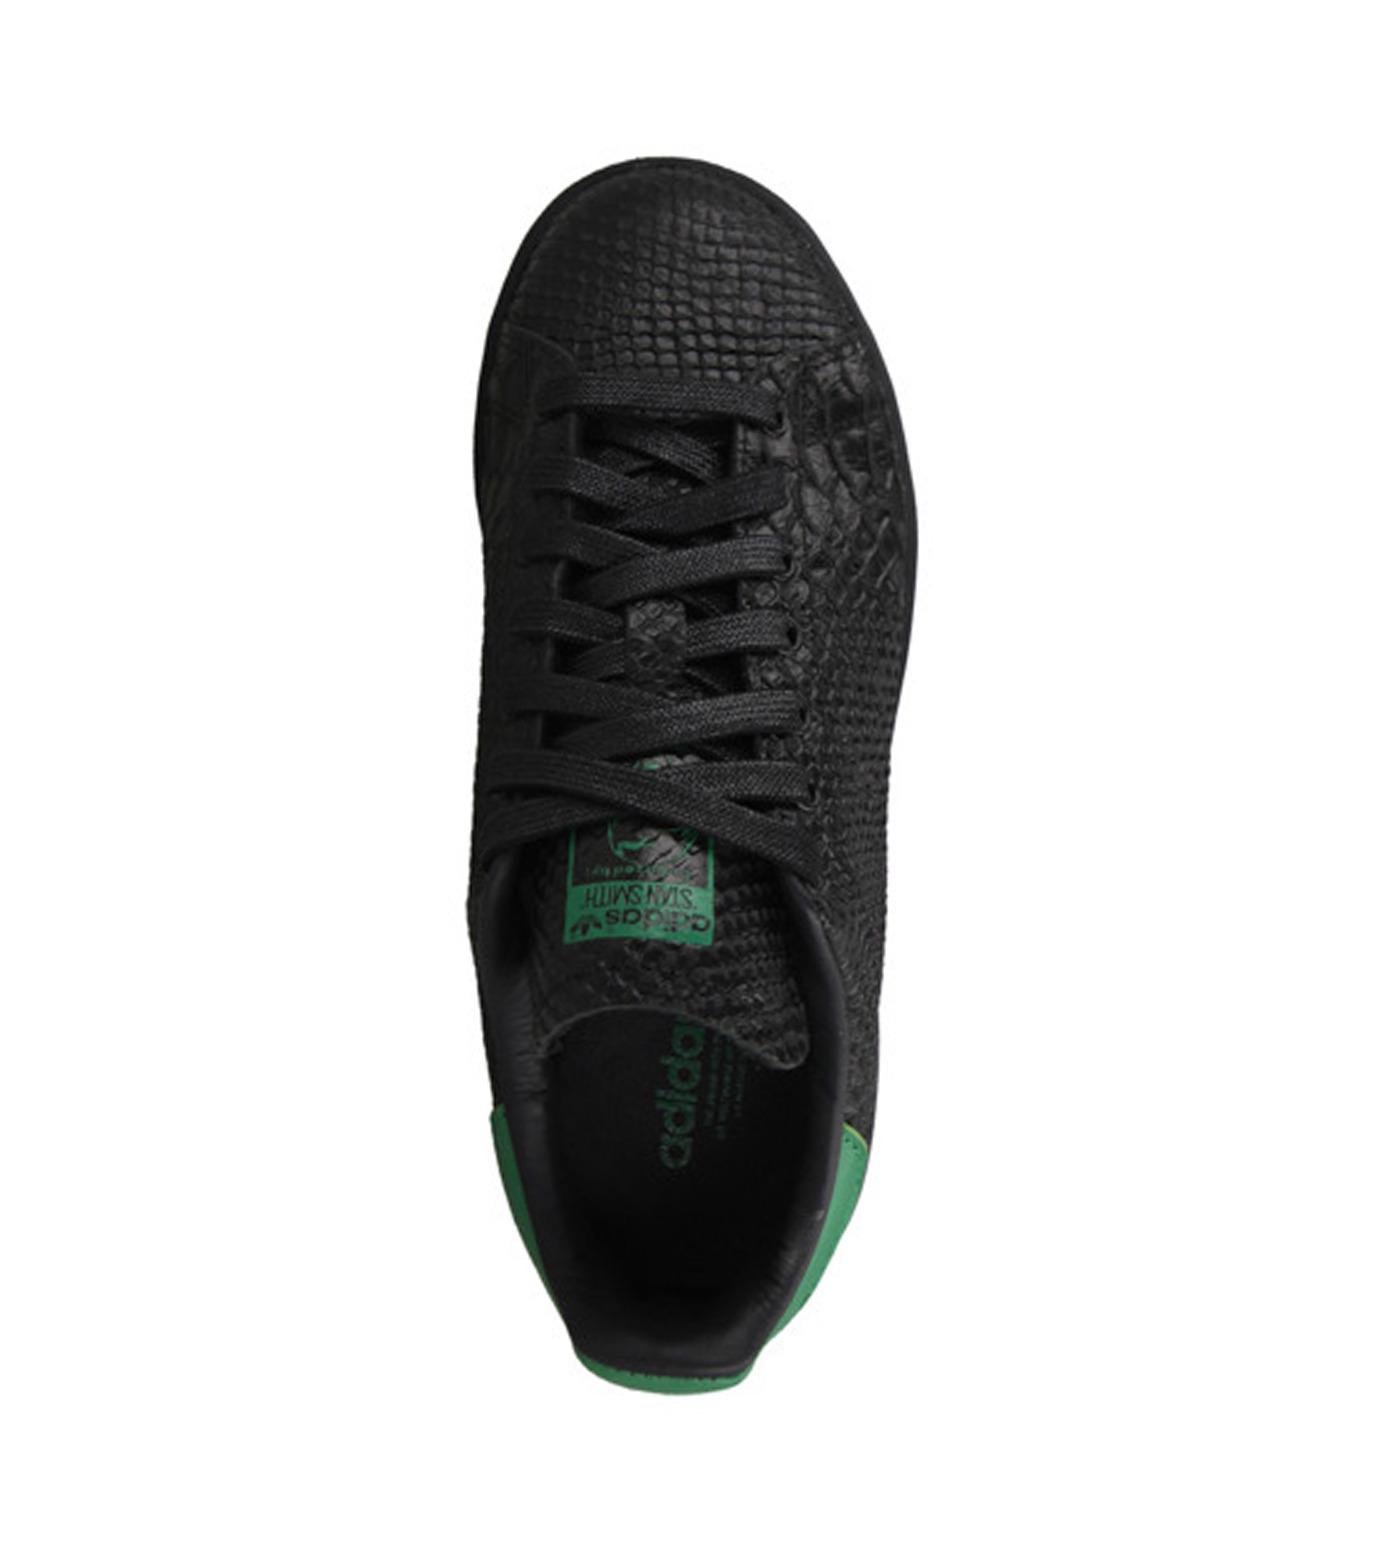 adidas(アディダス)のSUPERSTAR 80s-BLACK(シューズ/shoes)-S80022-13 拡大詳細画像3